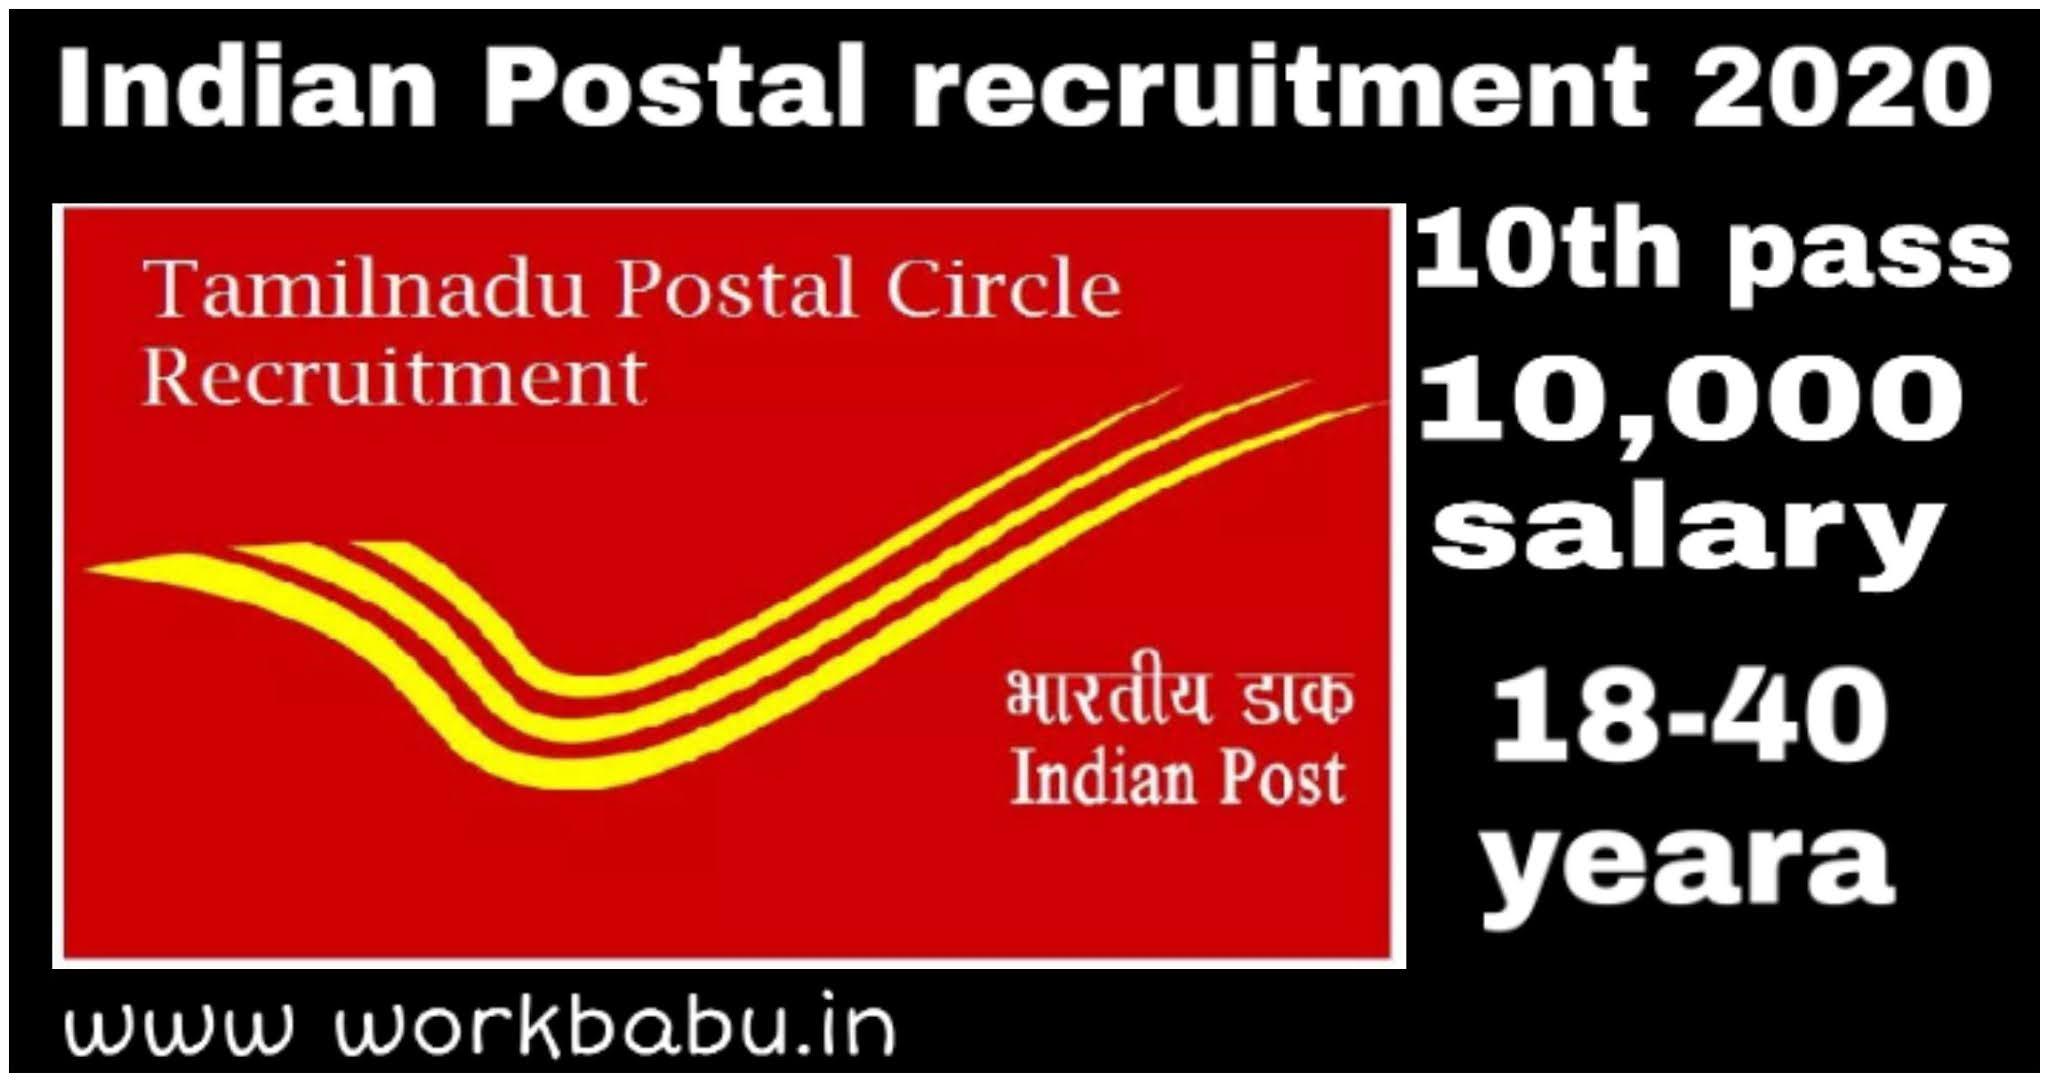 Indian Postal Recruitment 2020